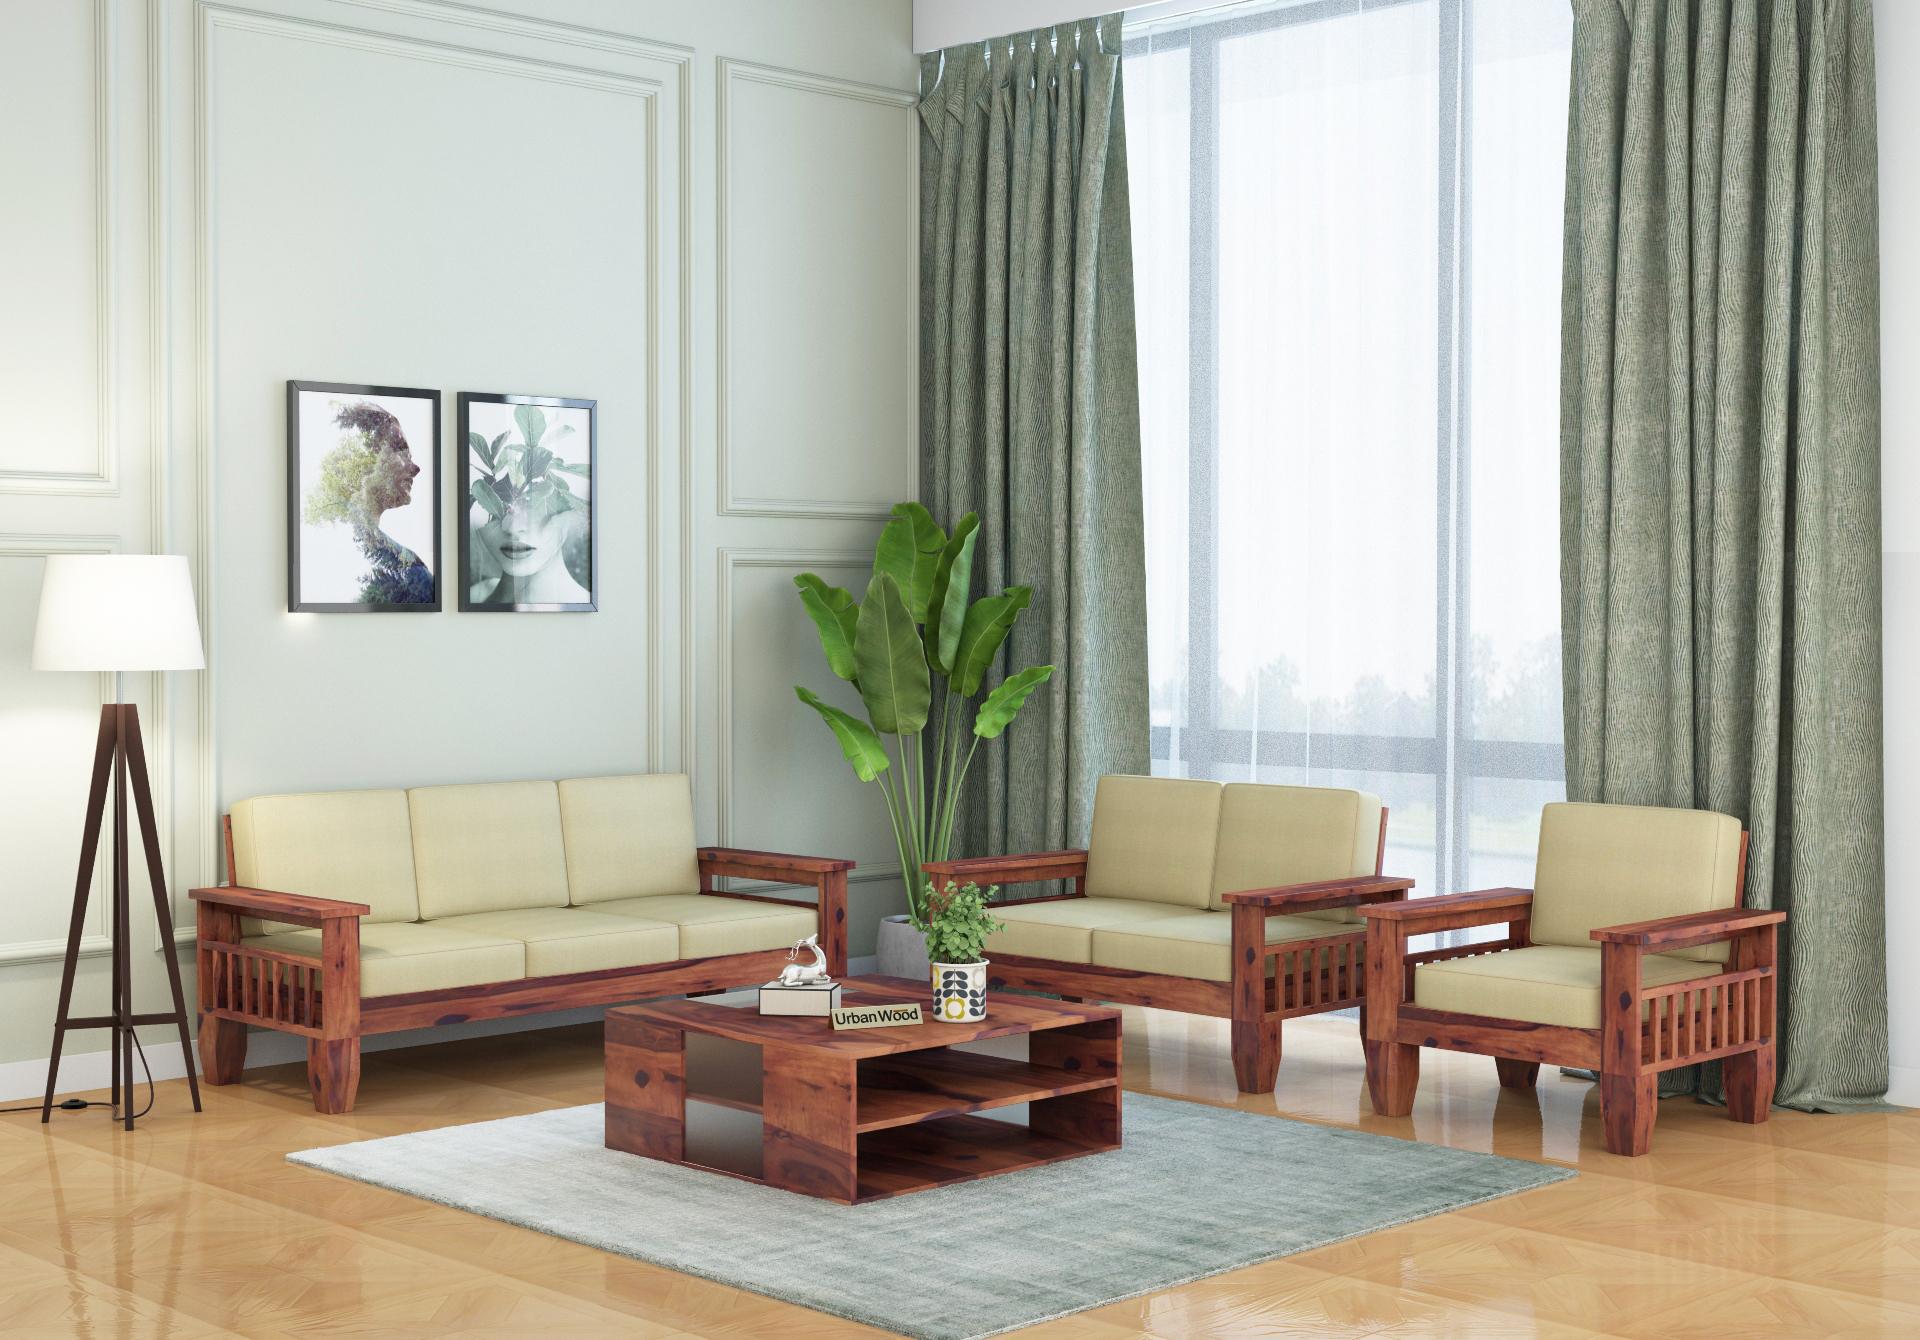 Freshlyn Wooden Sofa Set <small>(3+2+1) Seater ( Teak Finish )</small>